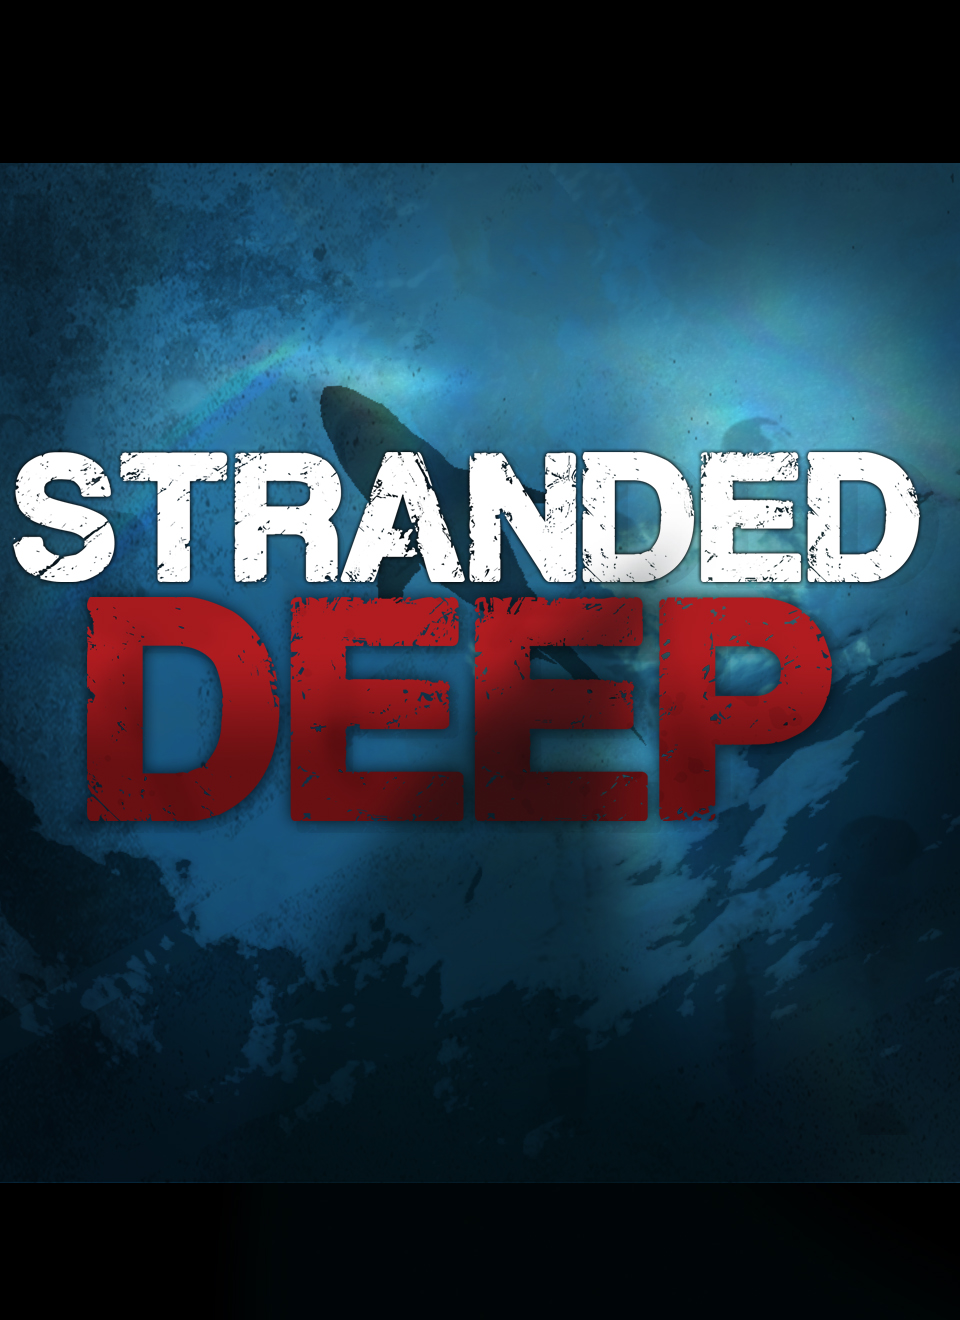 stranded deep oculus rift game vrdb